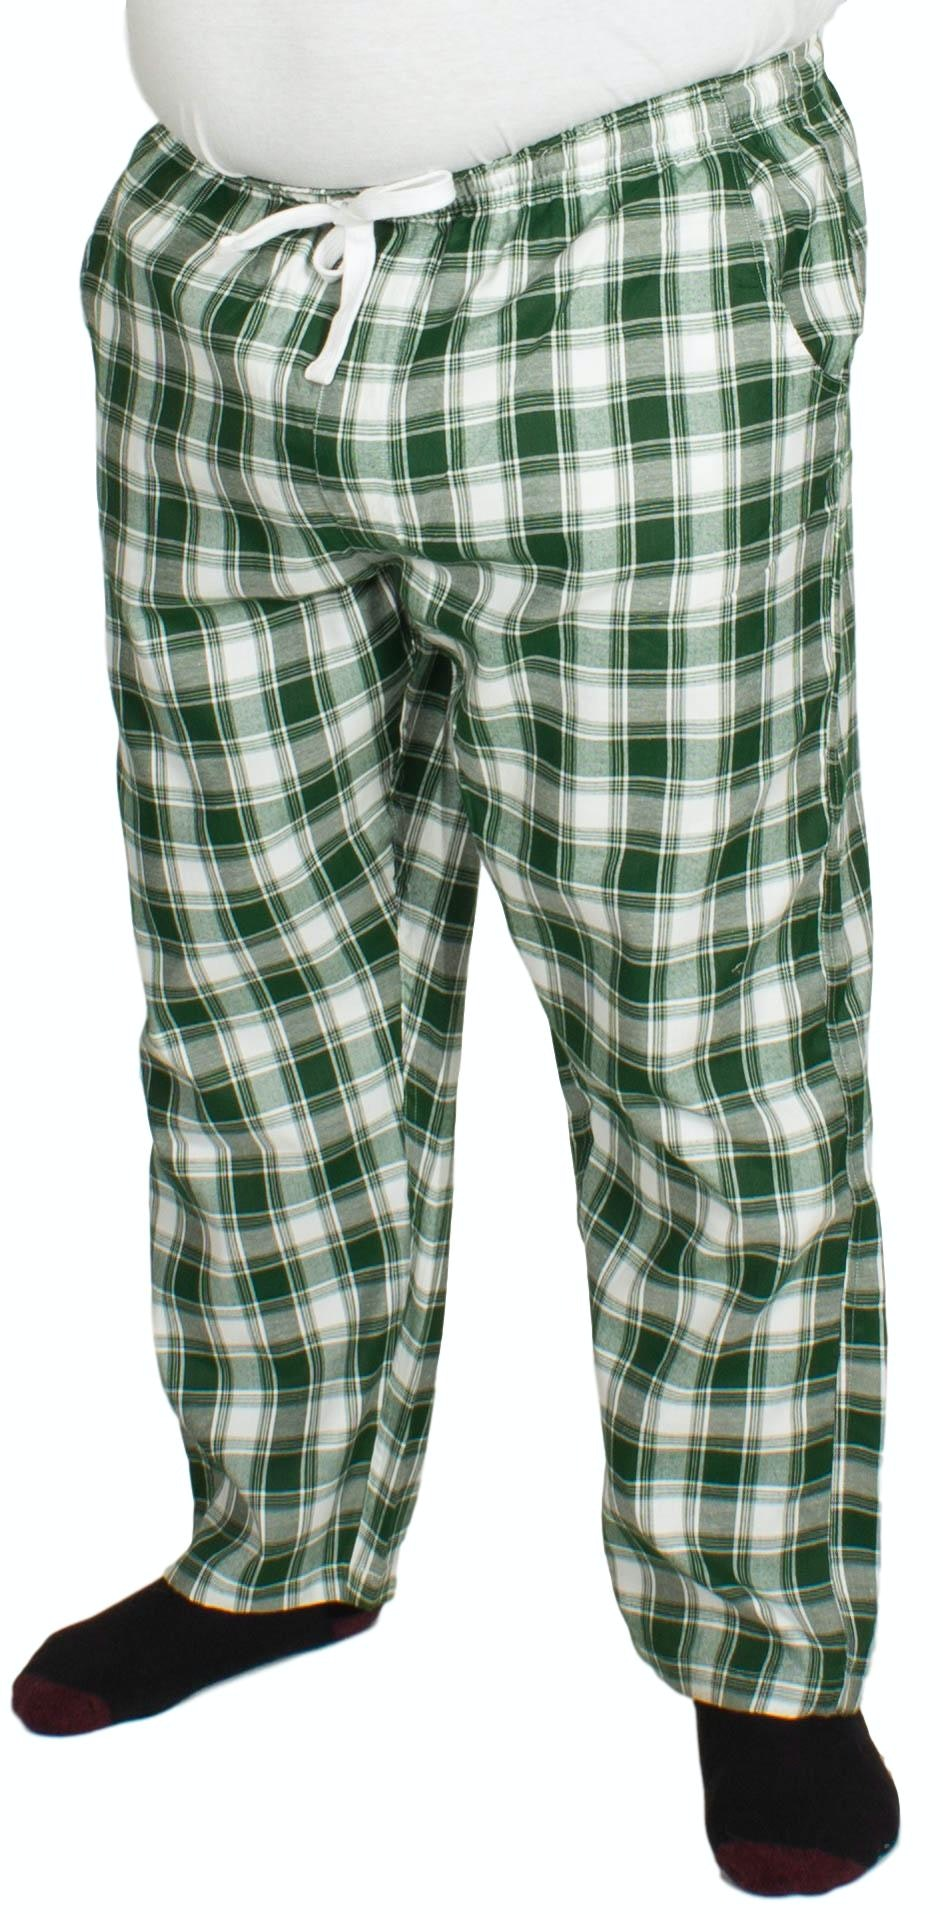 Bigdude Check Lounge Pants Green/White